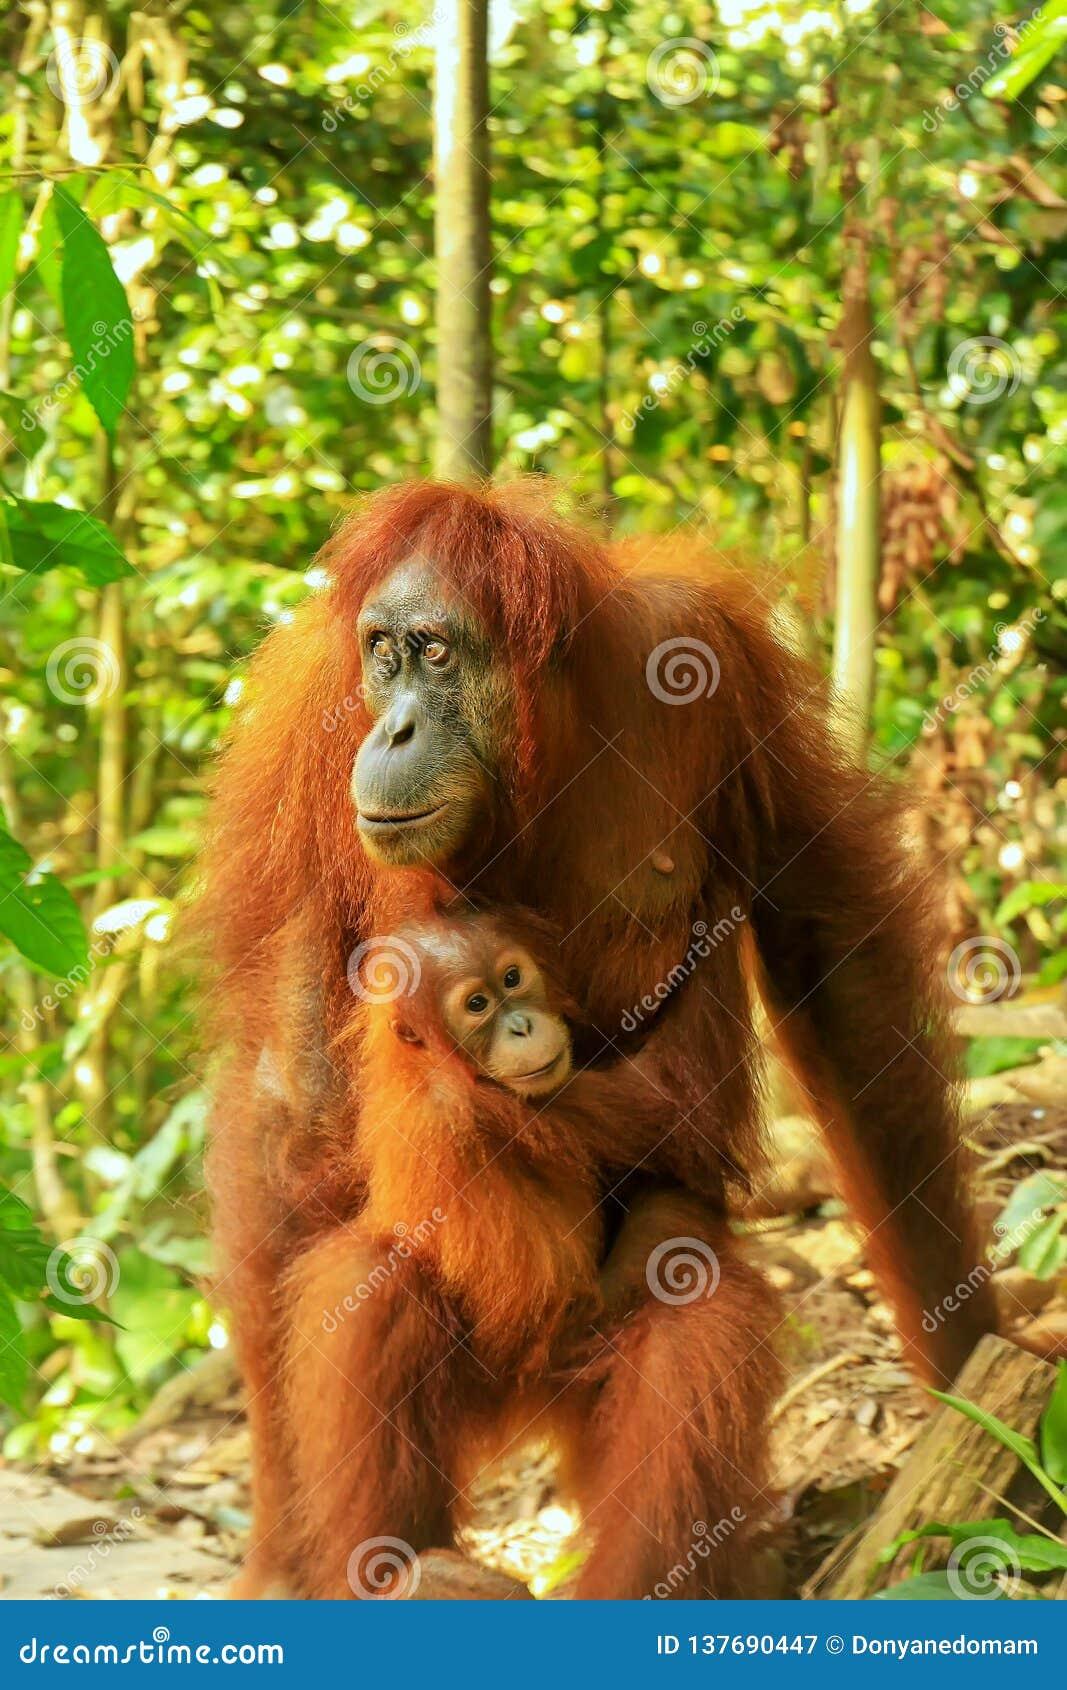 Orangutan Standing Near Tree And Chews A Banana (Bohorok